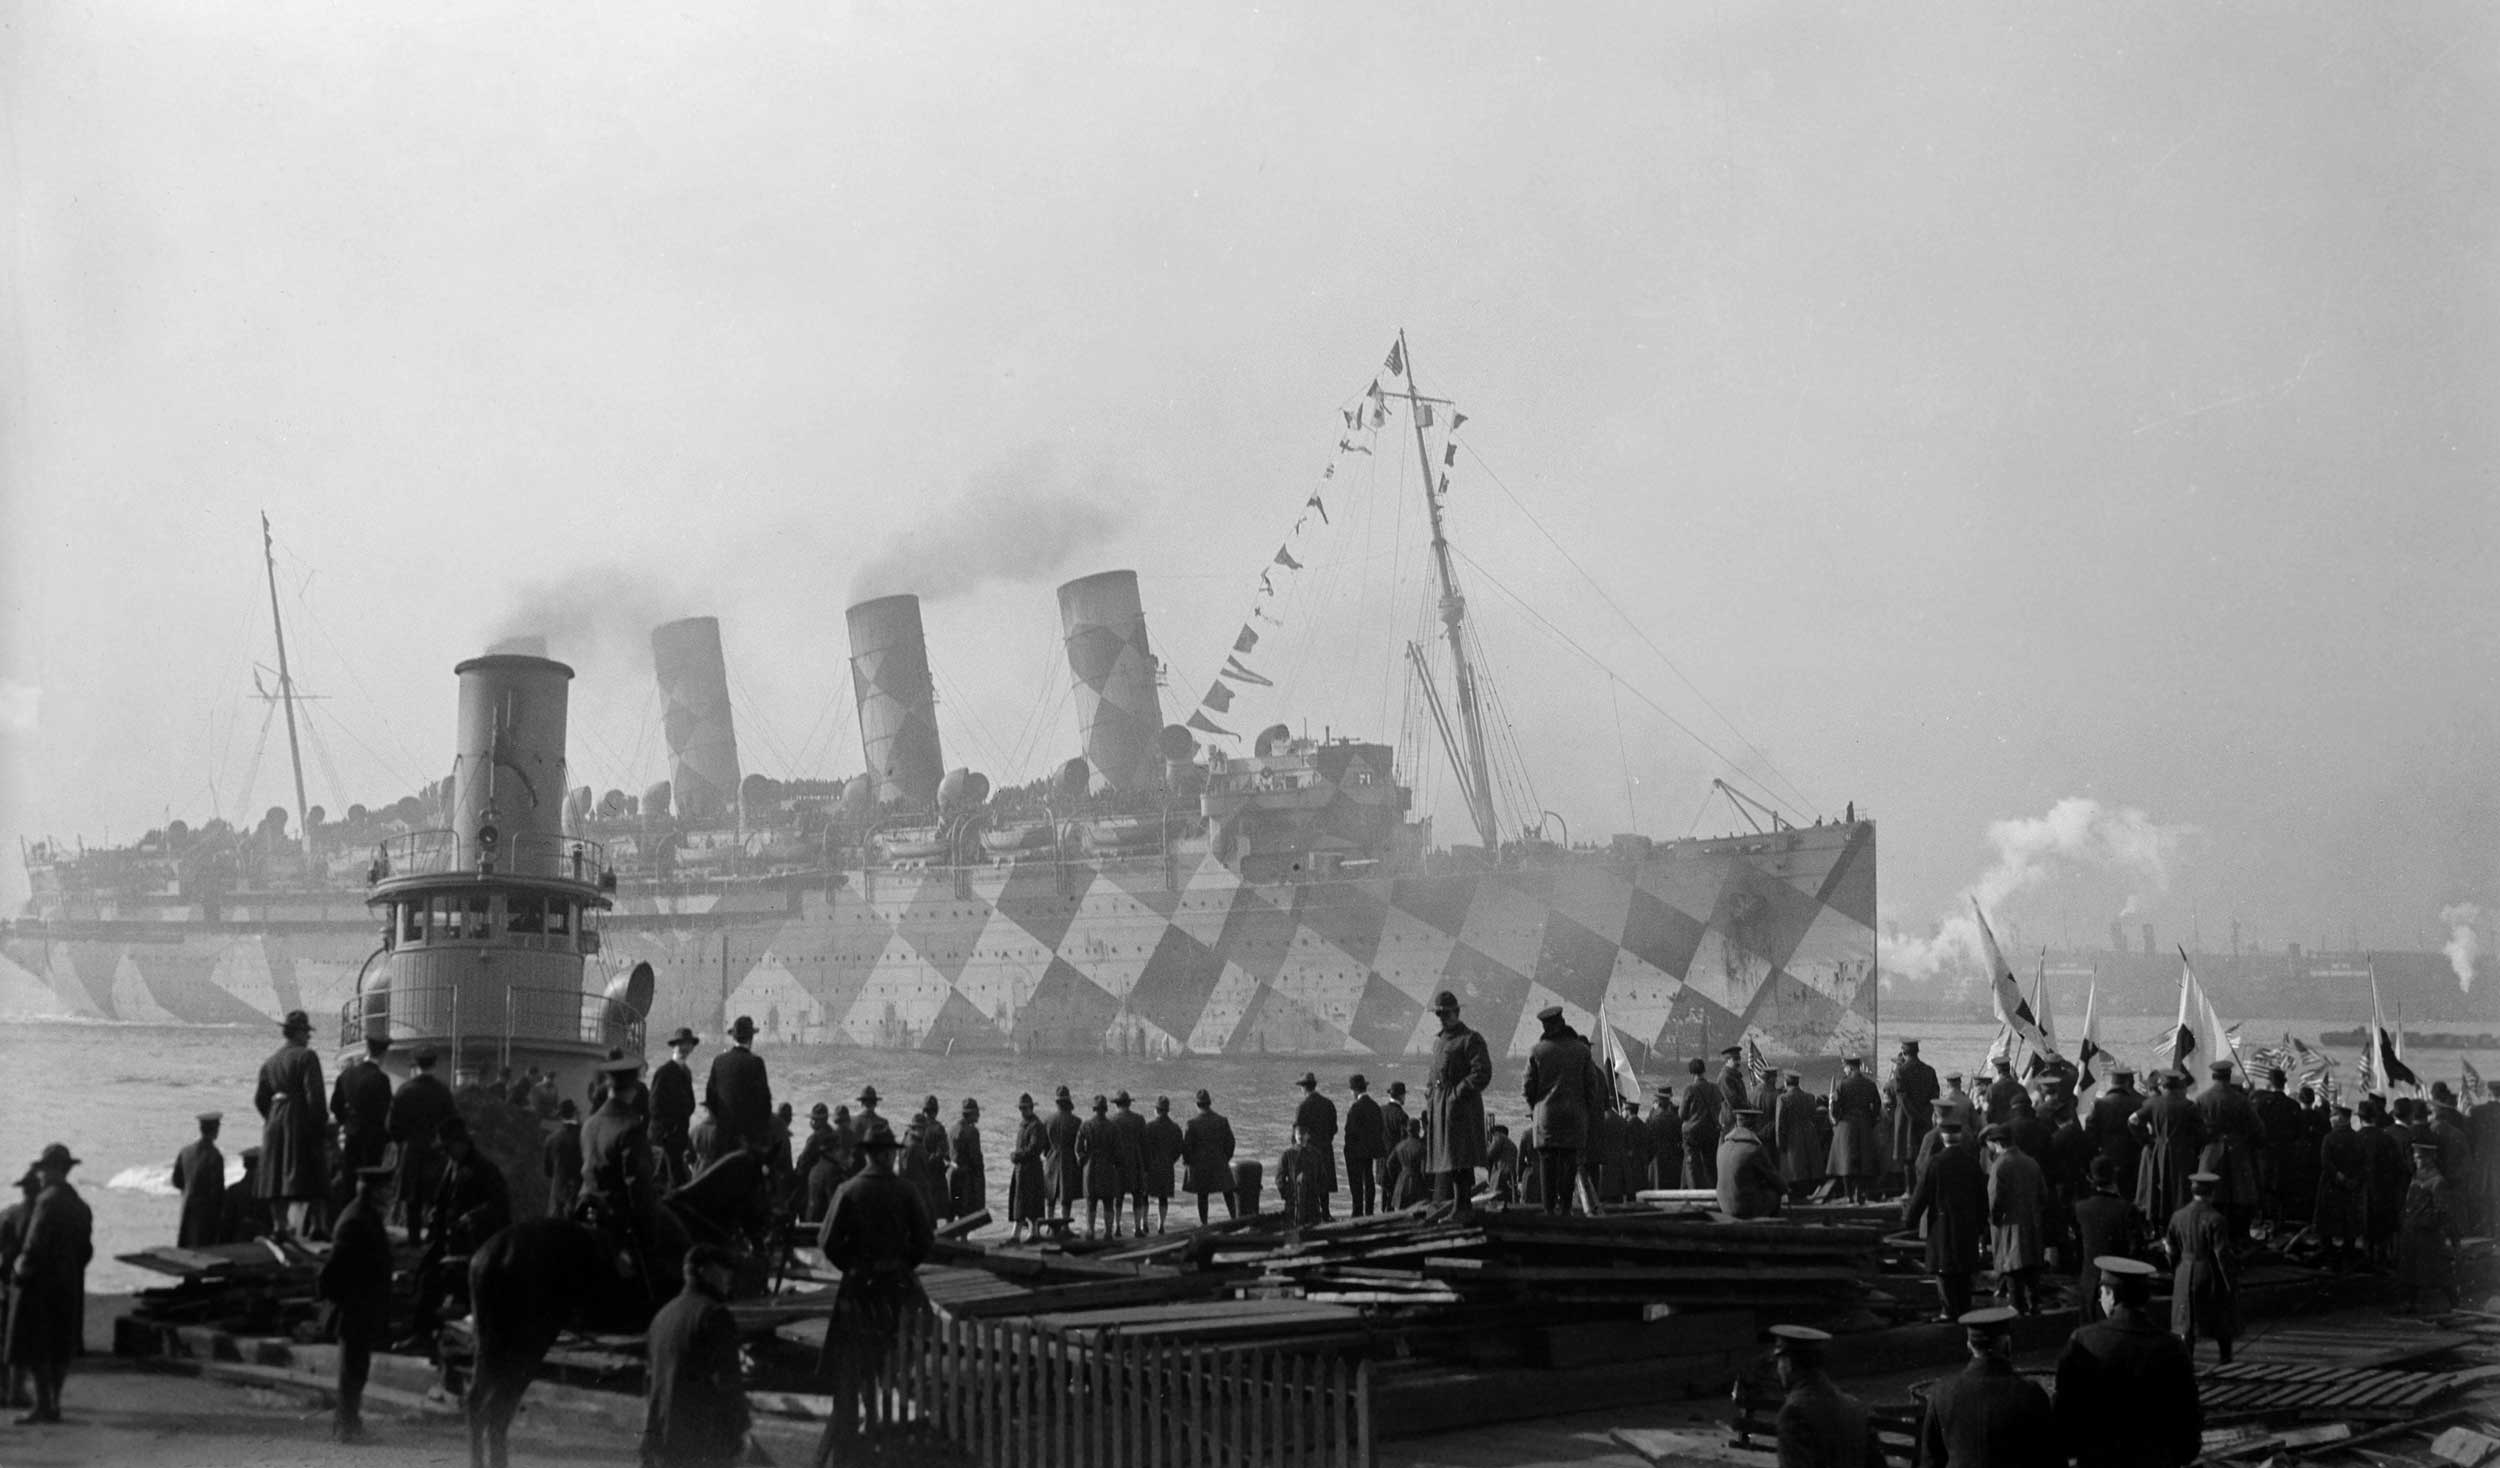 dazzle-ship-mauretania-4.jpg